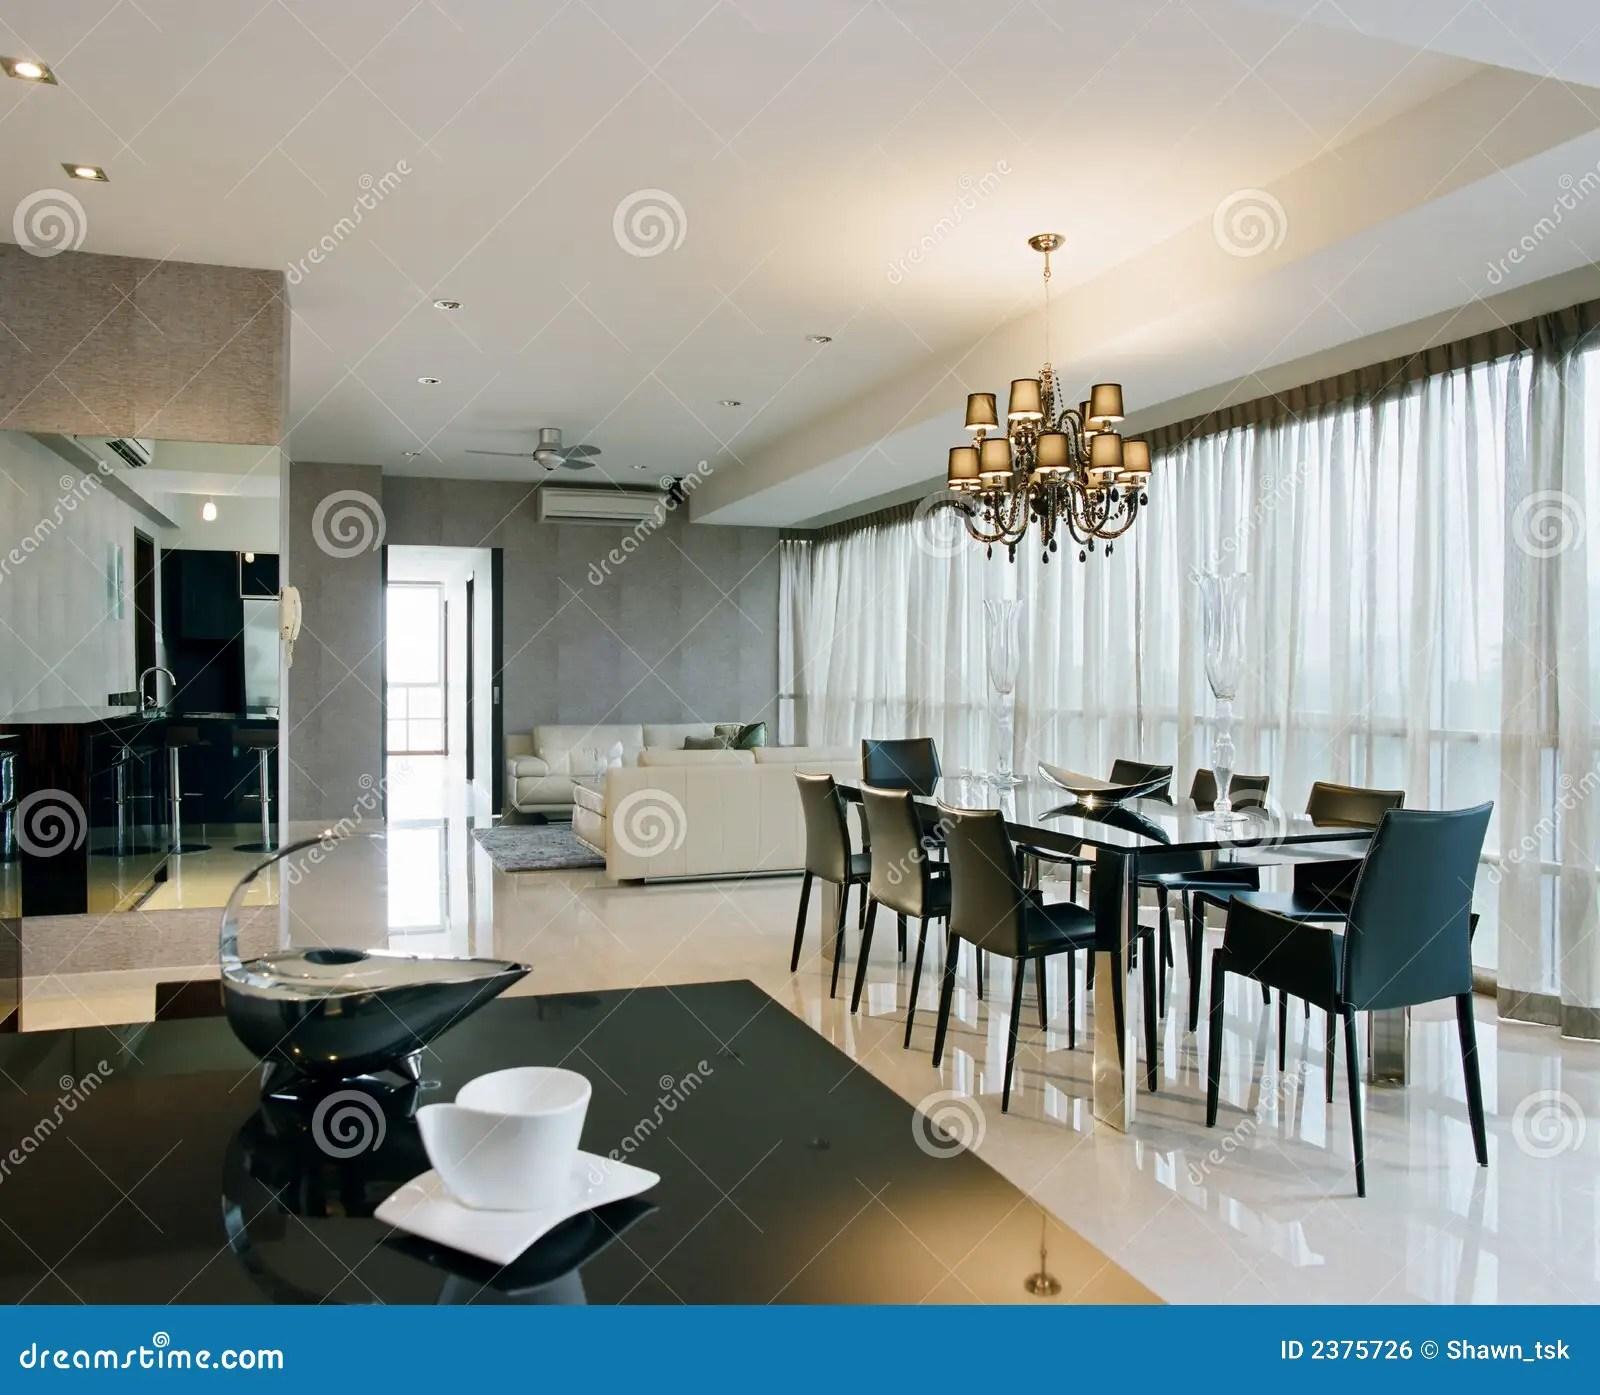 Interior Design  Dining Area Stock Photo  Image 2375726